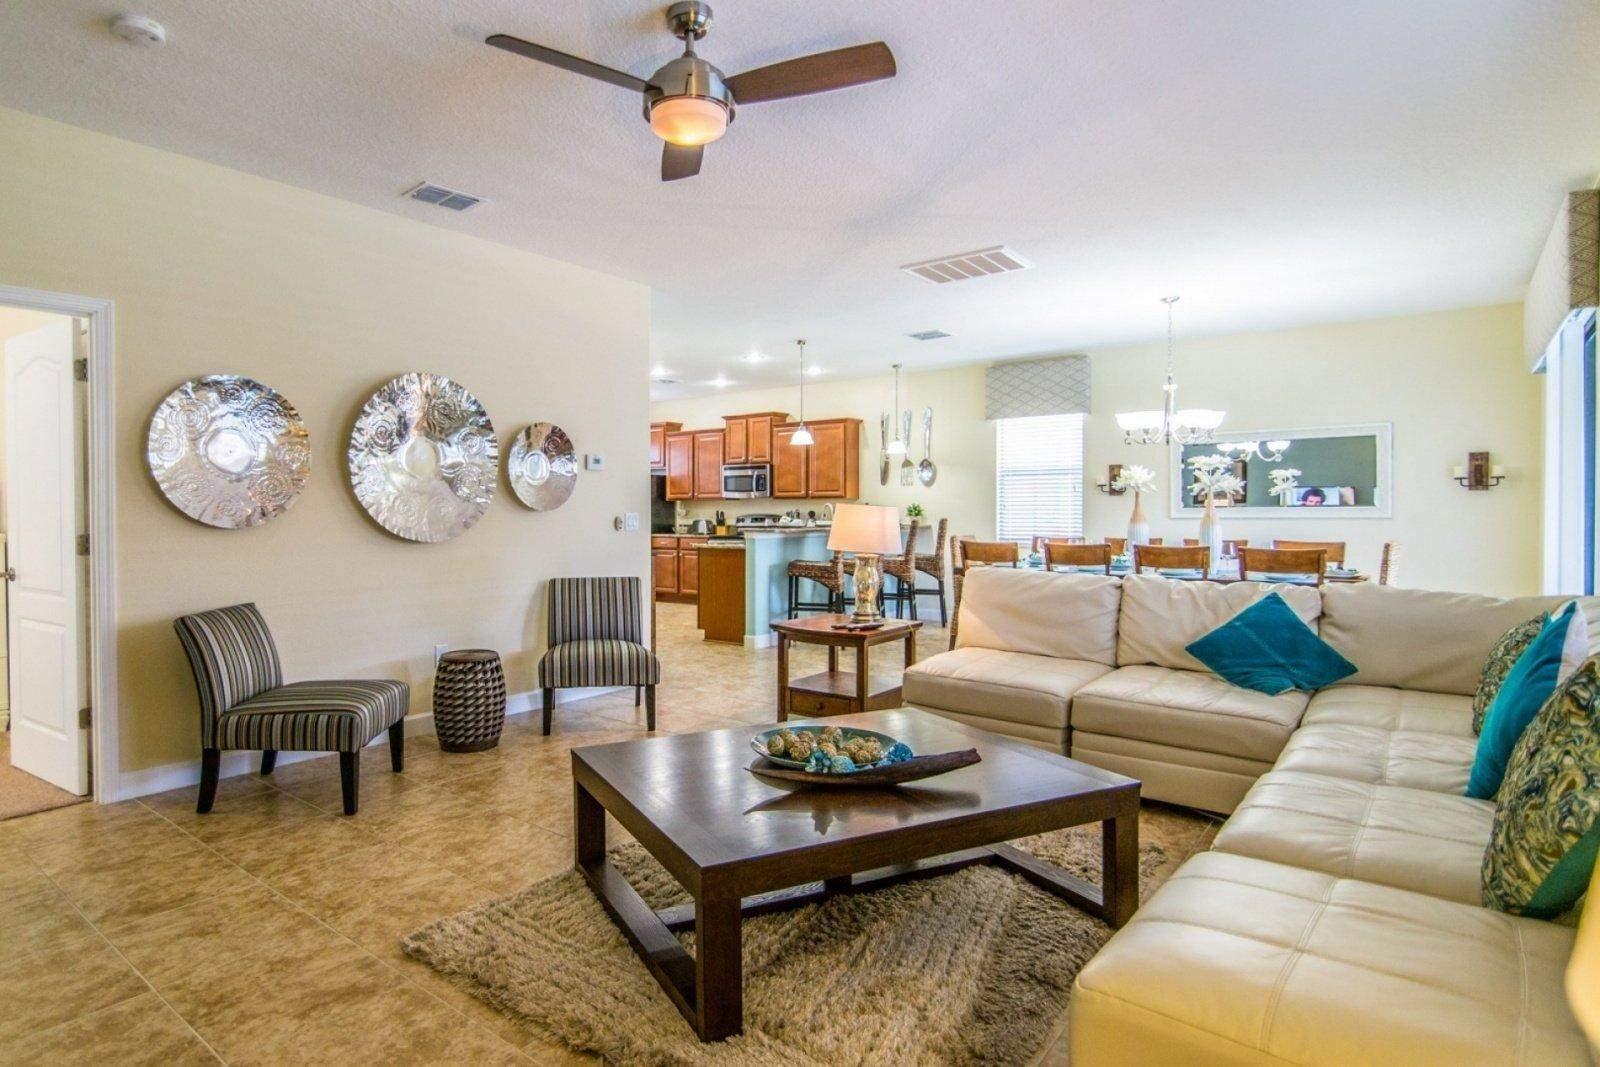 28 Vacation Rental Interior Design And